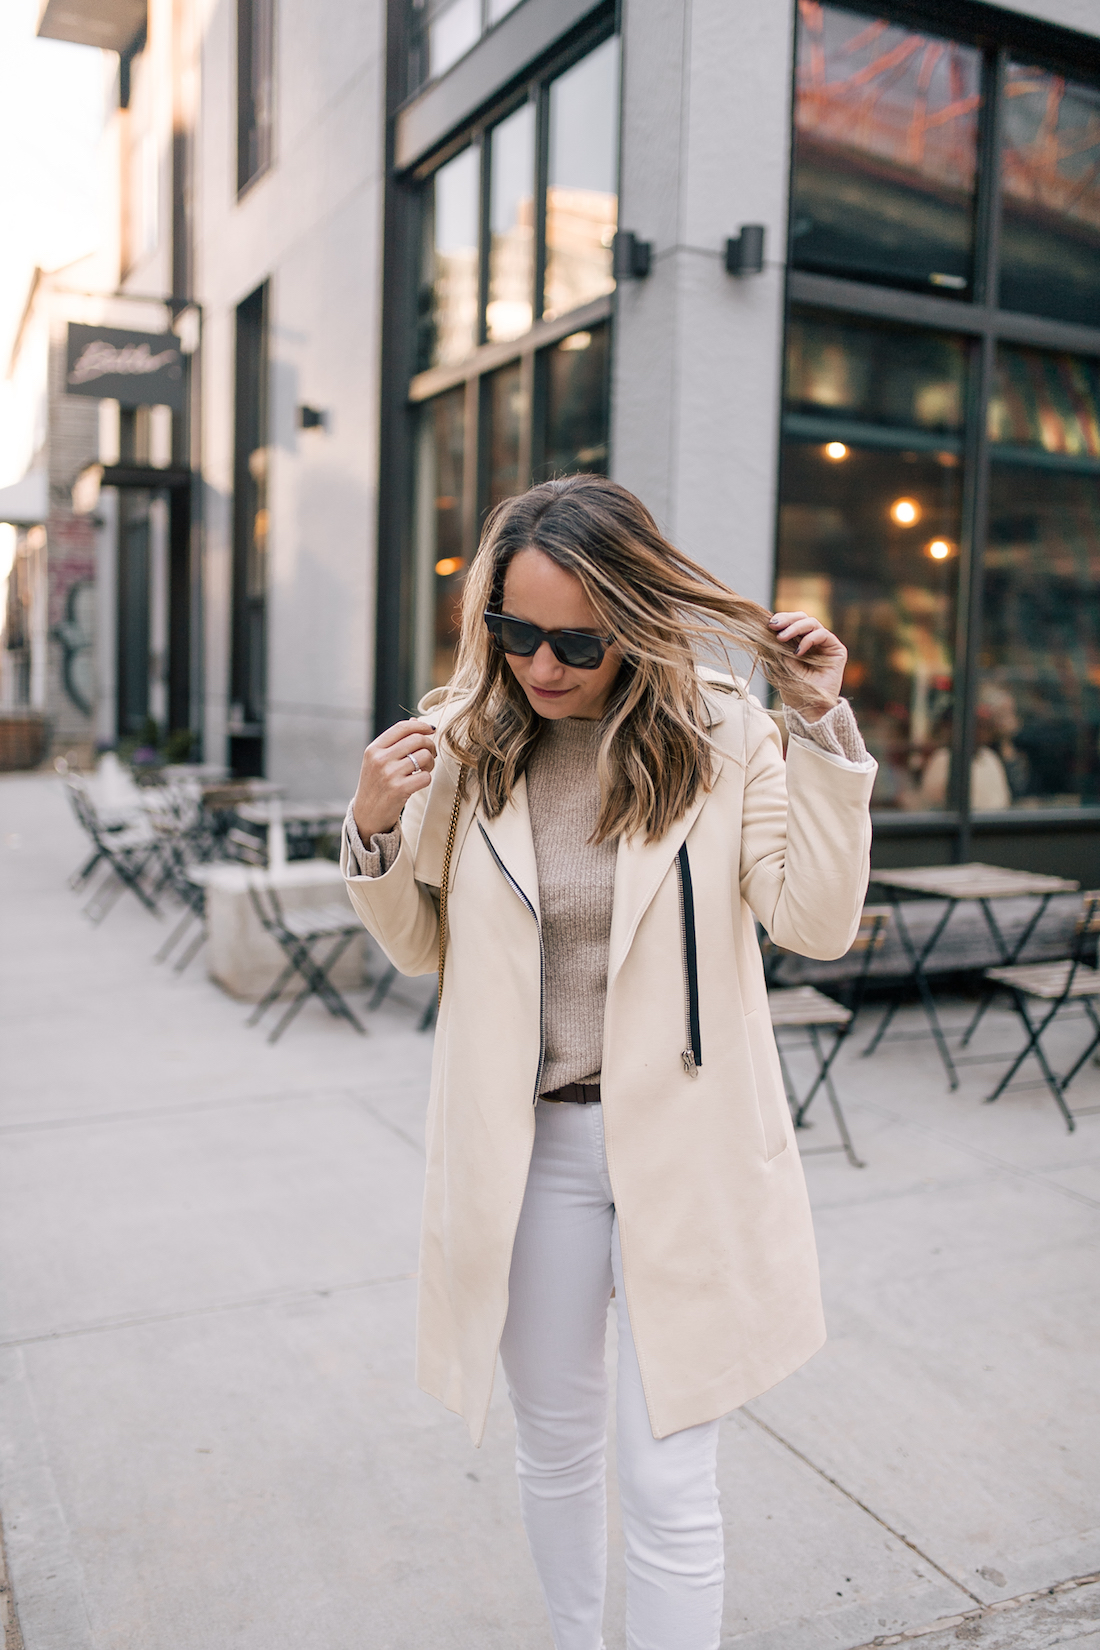 Outfit Details: Sandro Coat // ASOS Sweater // 7 for all Mankind Jeans // J.Crew Belt // Celine Sunglasses //